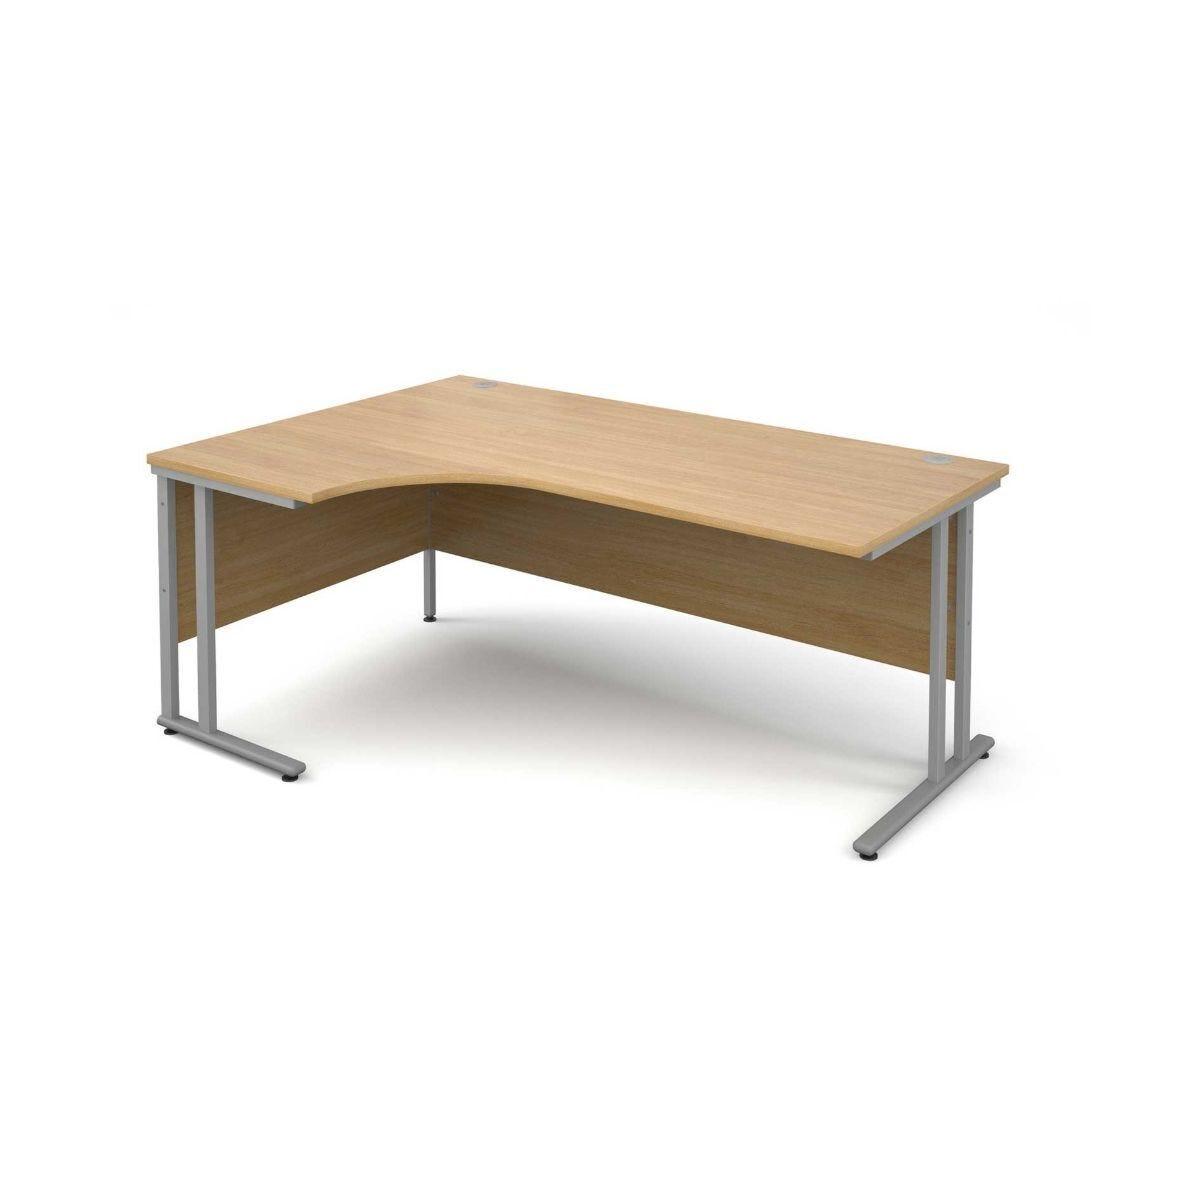 Maestro 25 Left Hand Ergonomic 1800 Desk with Silver Legs Oak